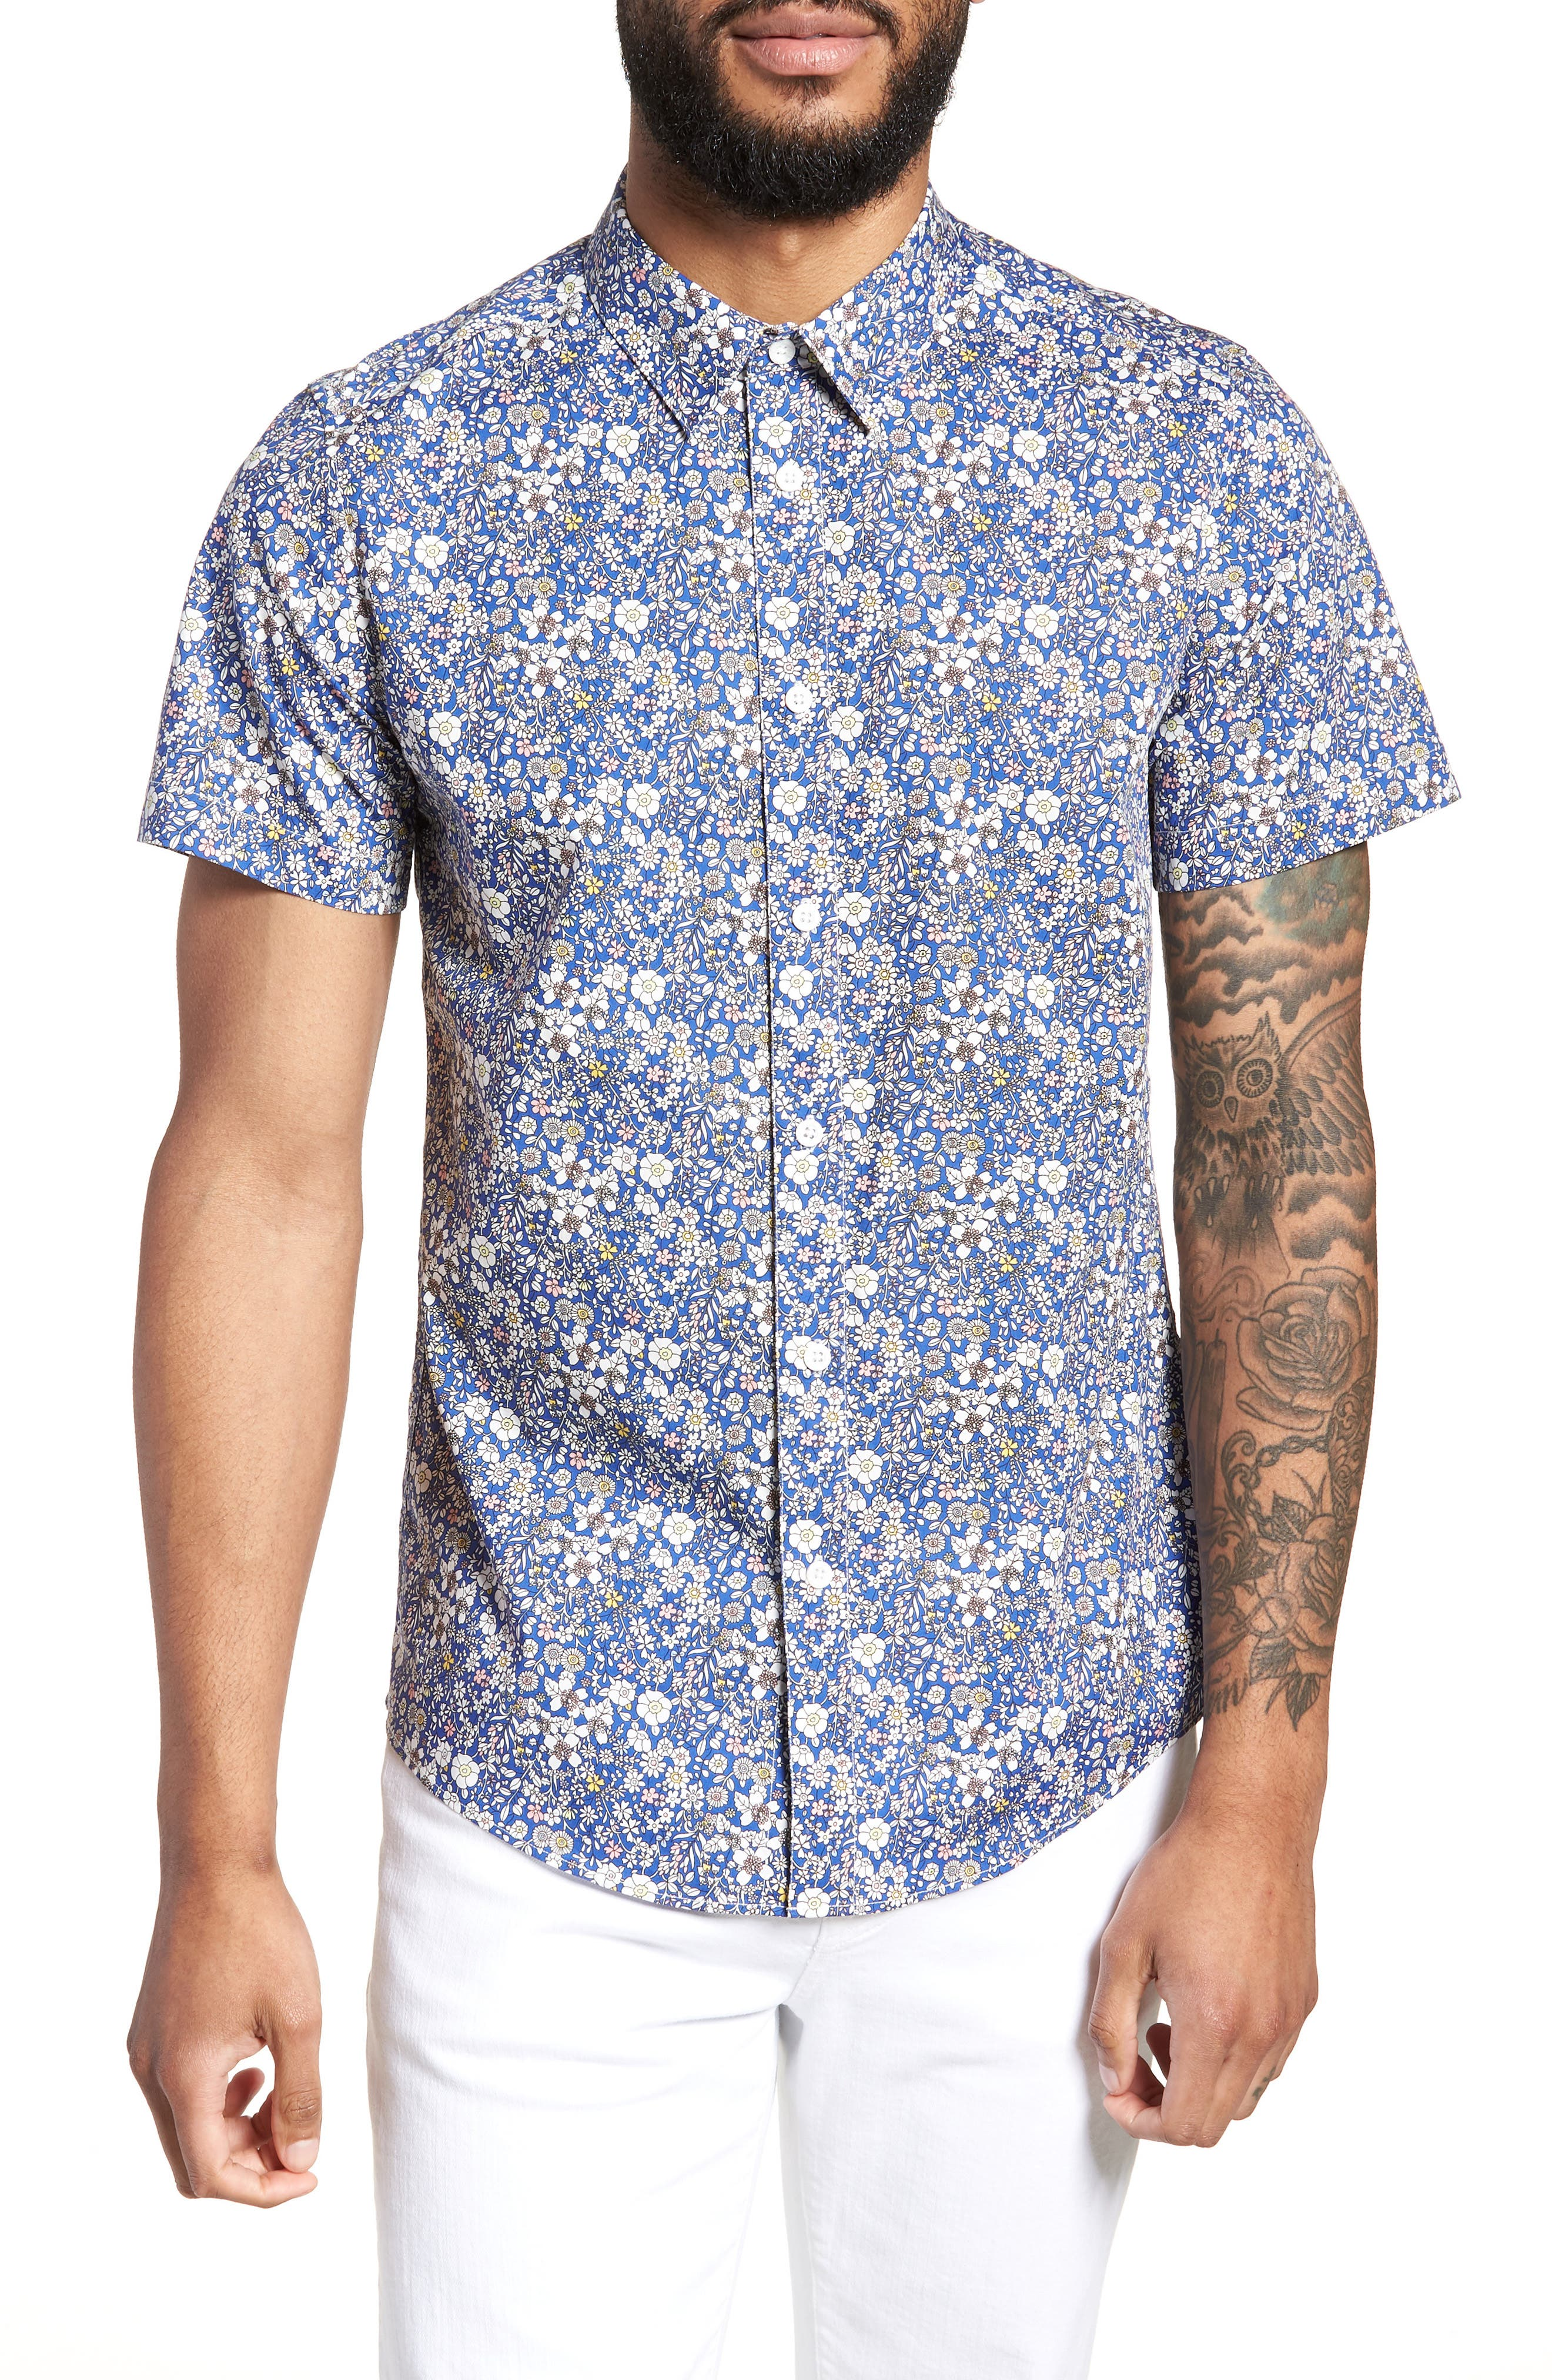 Trim Fit Print Woven Short Sleeve Shirt,                             Main thumbnail 1, color,                             Blue Pink Floral